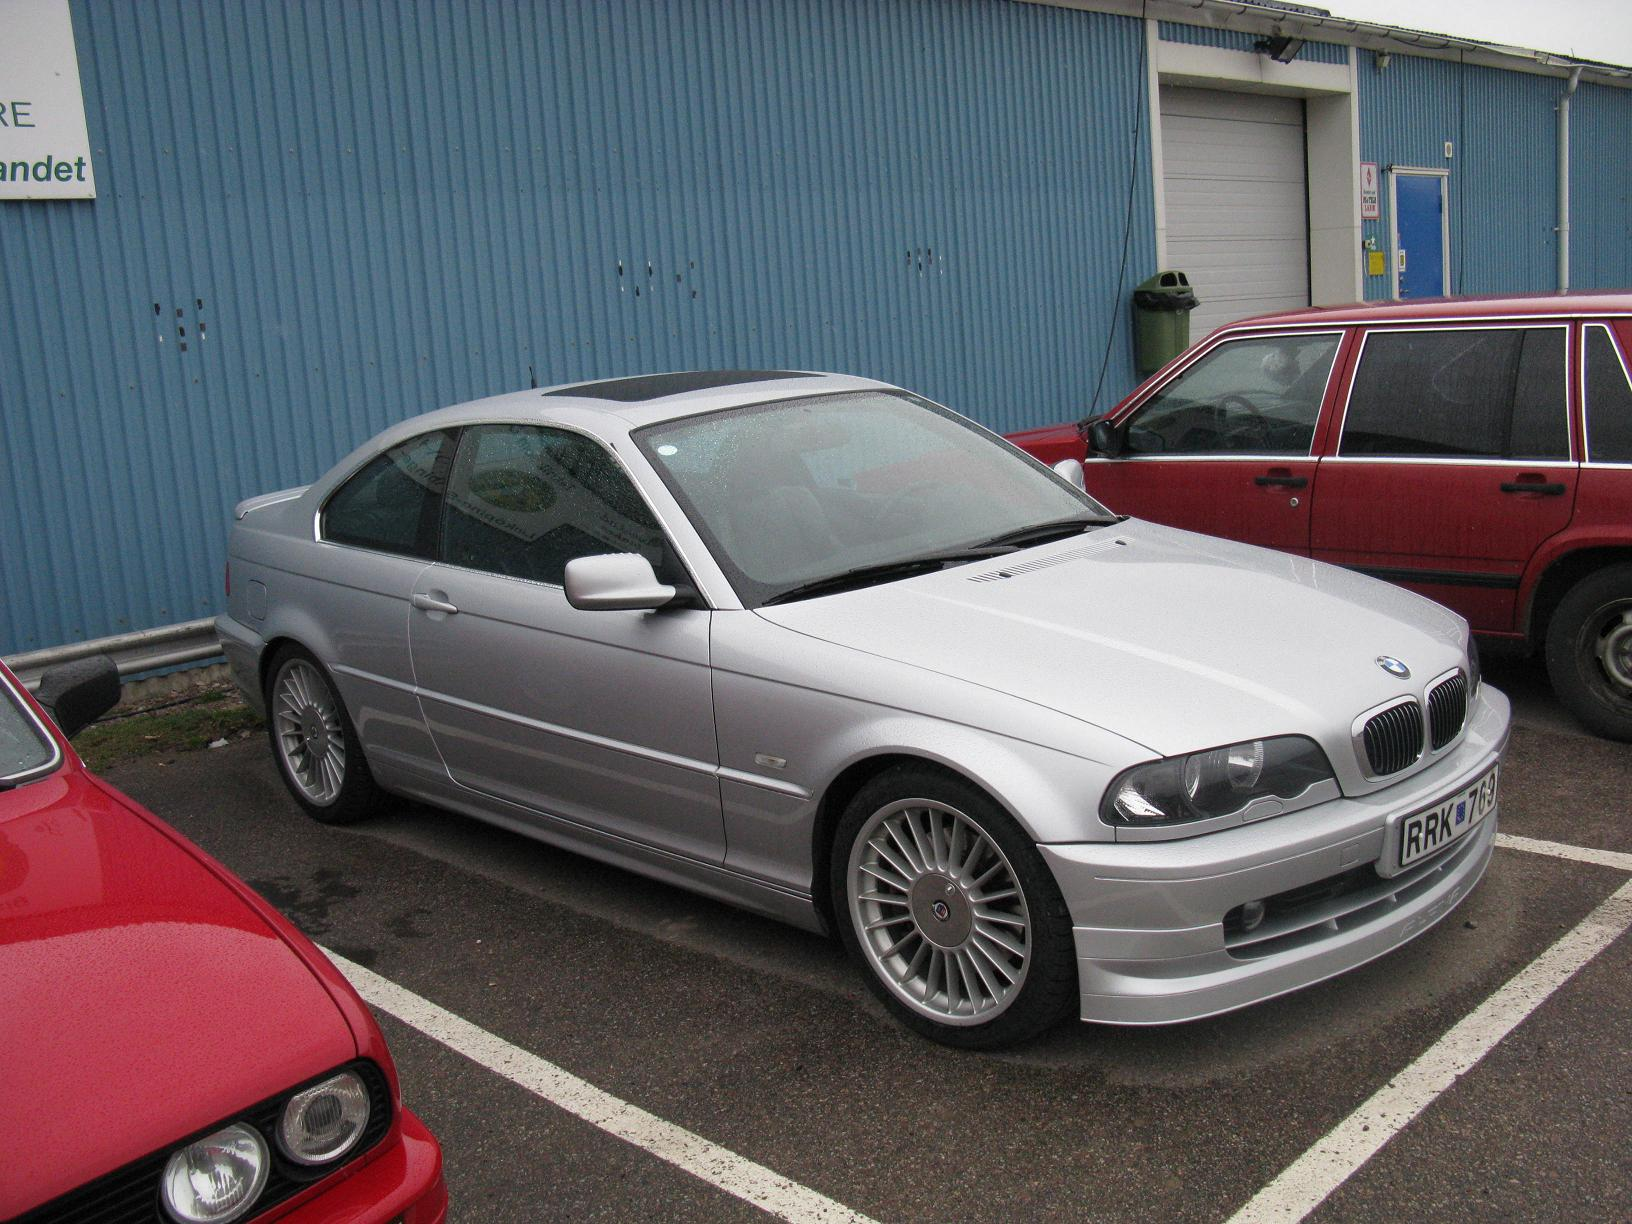 File:BMW Alpina B3 3.3 Coupé (4590546316).jpg - Wikimedia Commons